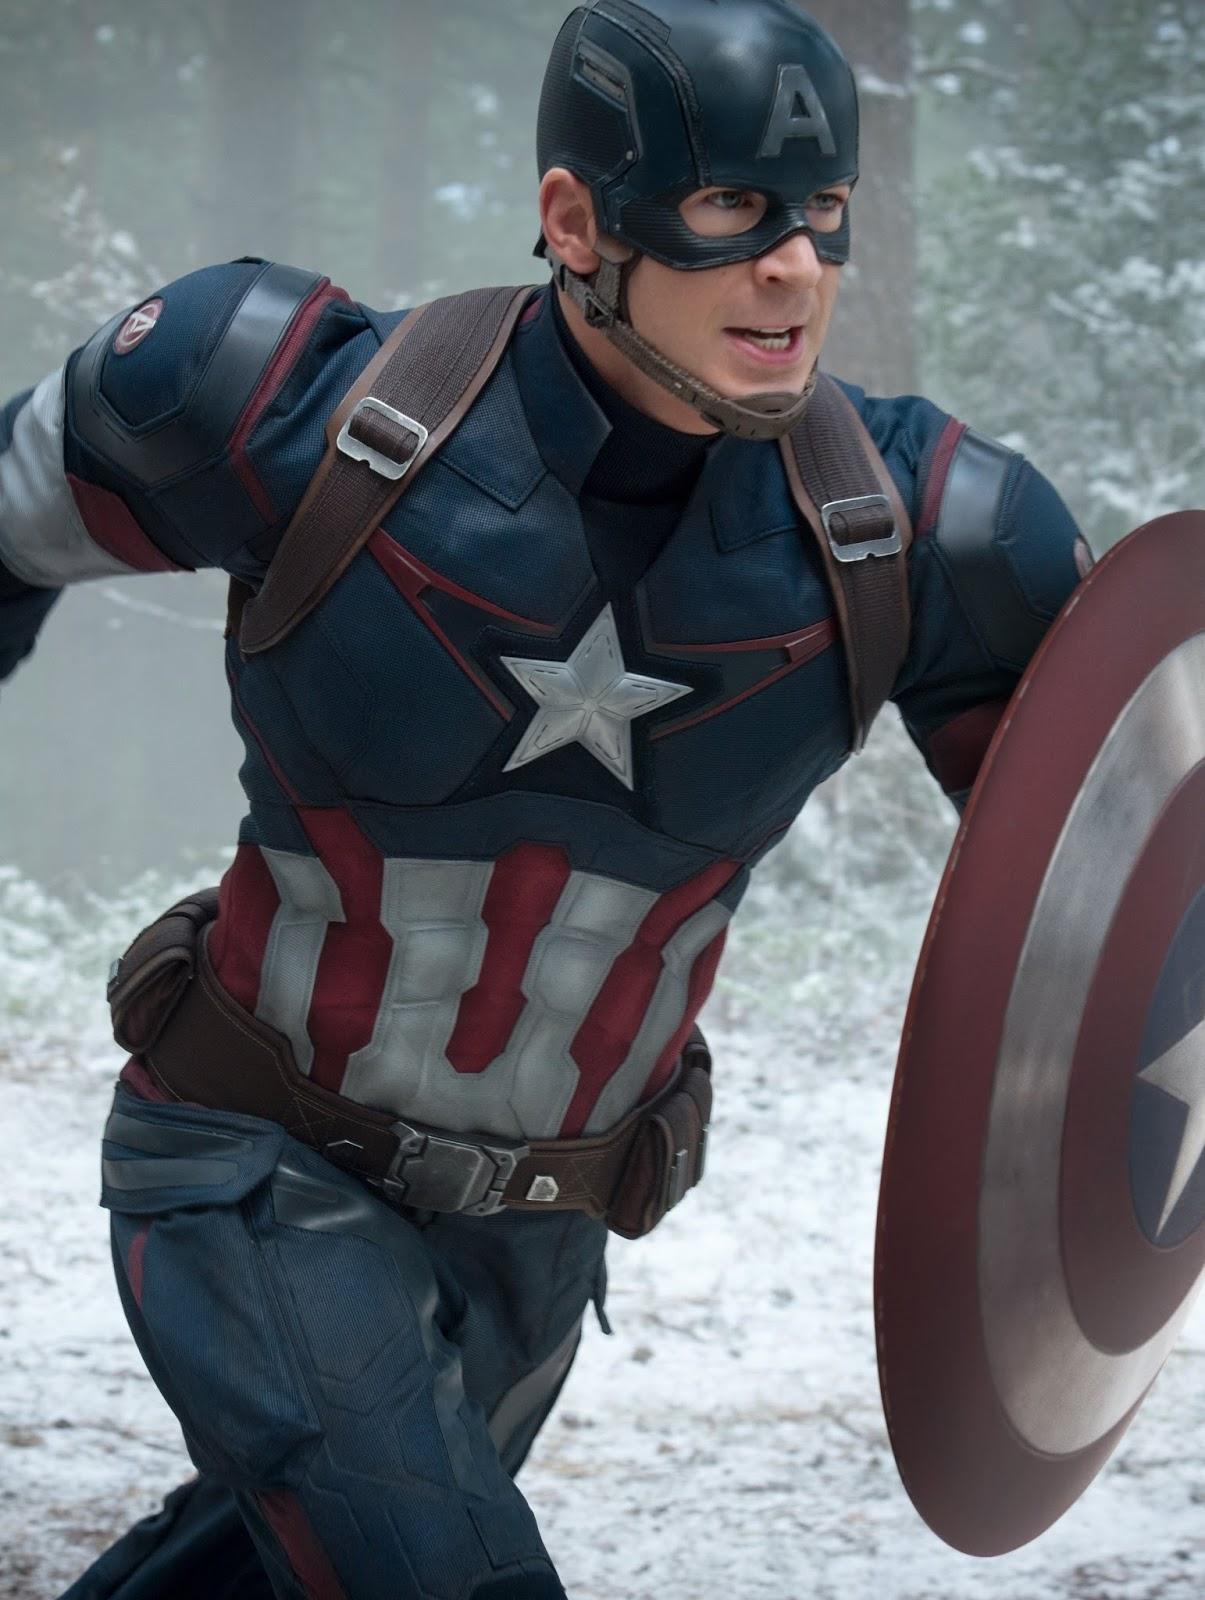 savage marvel cinematic universe: steve rogers—captain america